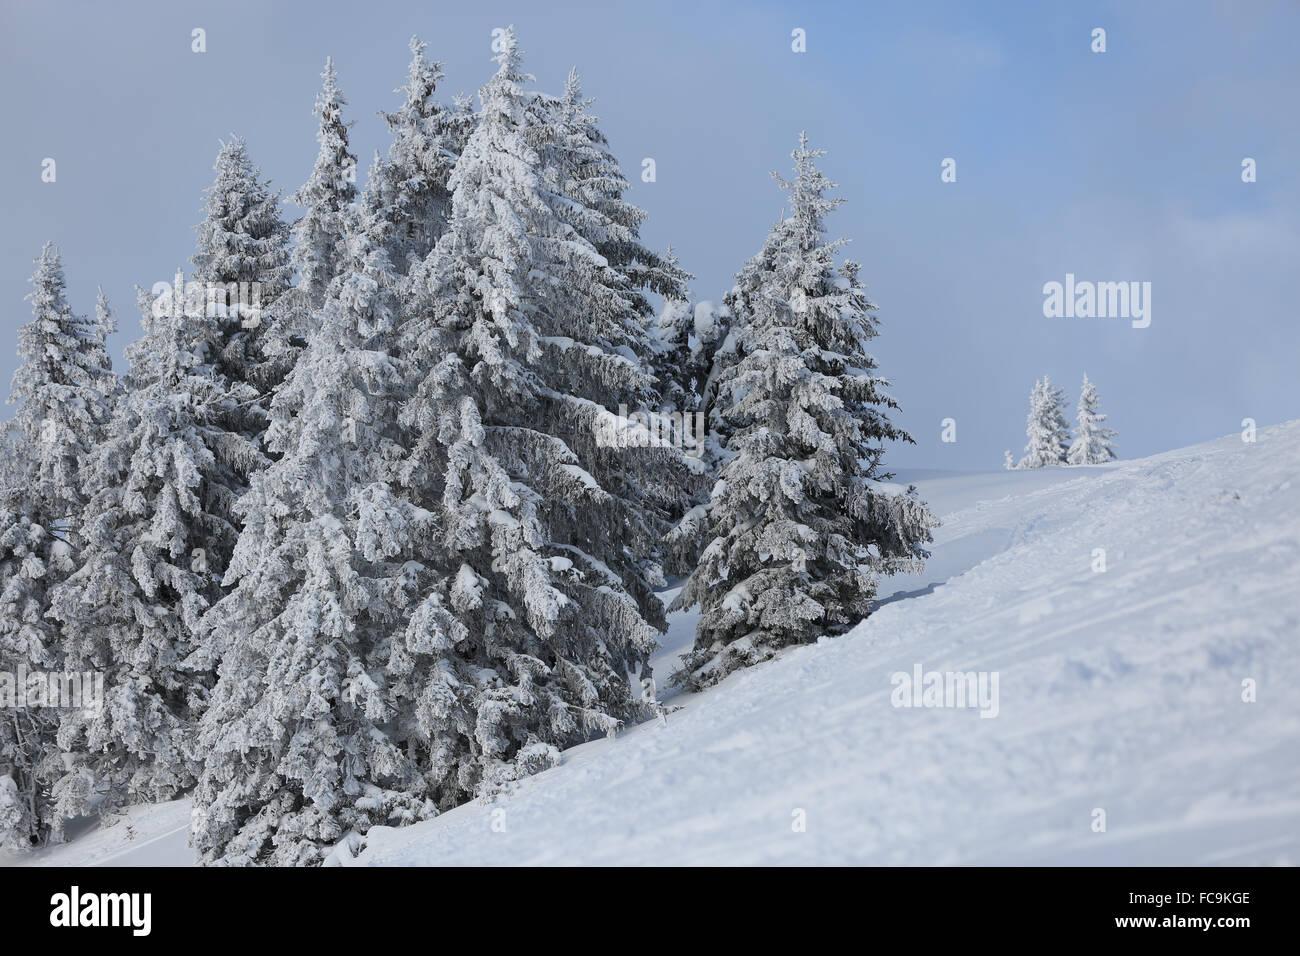 Snow covered trees, France, Port du Soleil - Stock Image